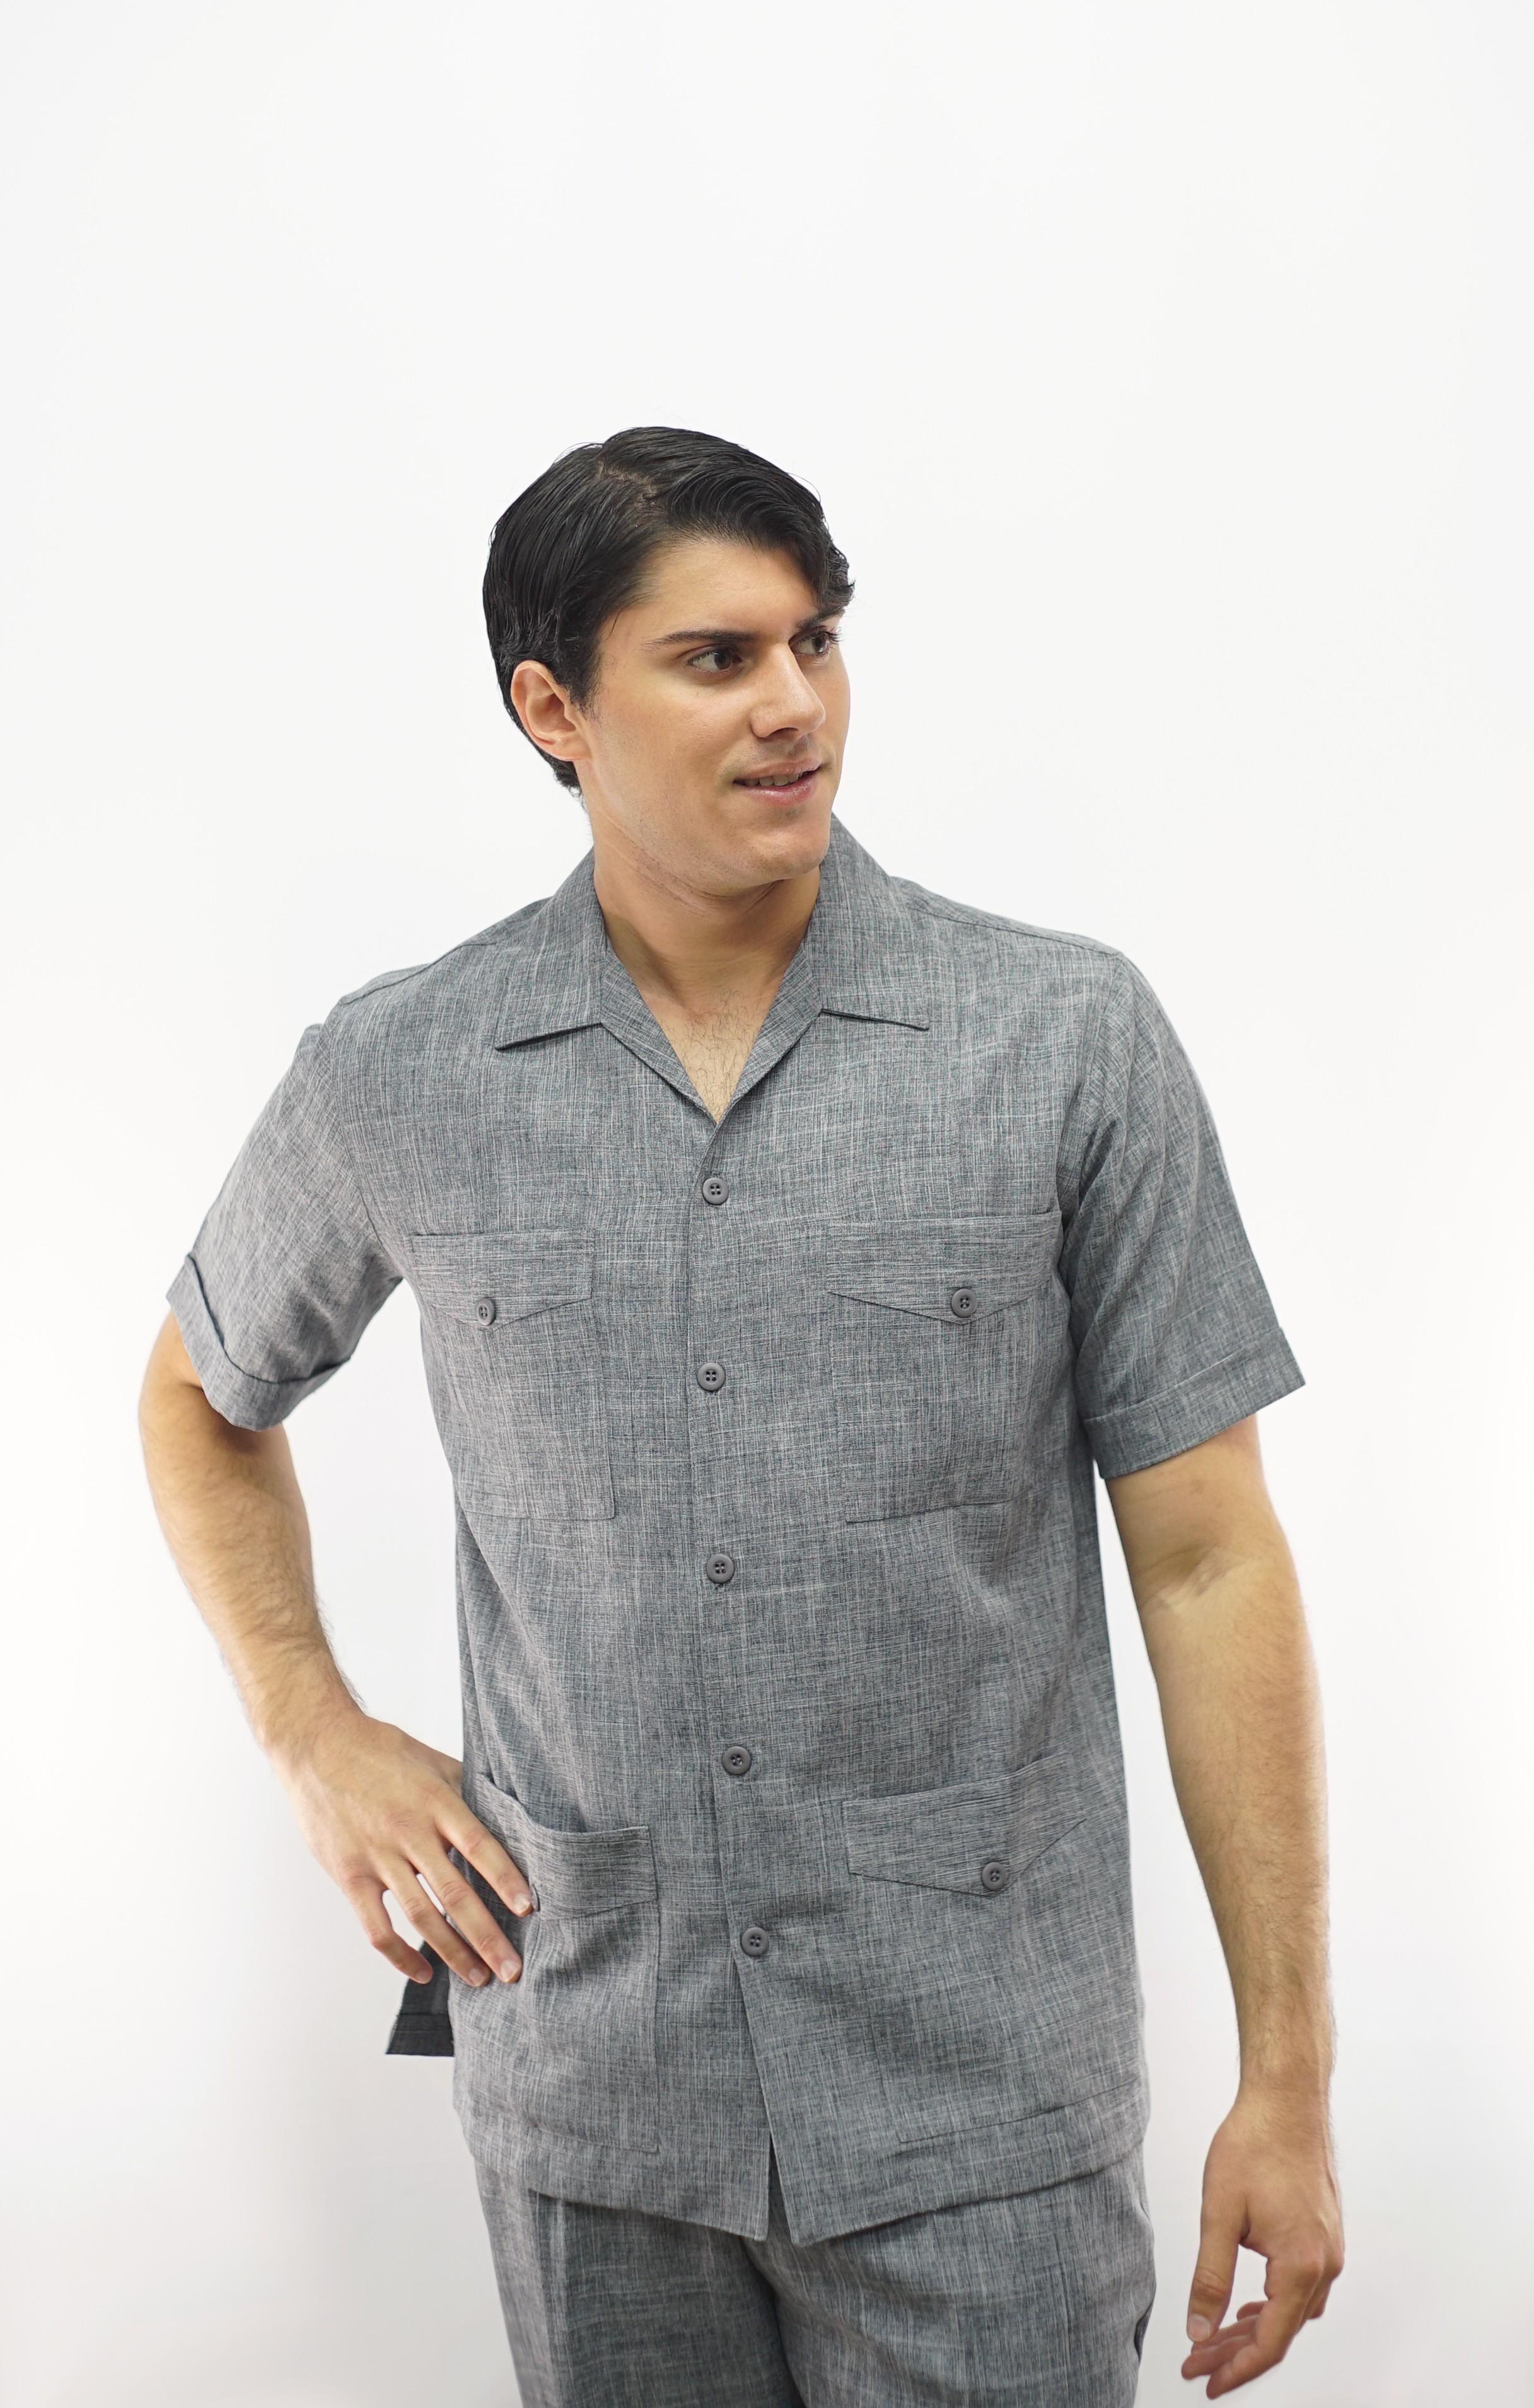 Guayabera 8287 Grey Safari Set Leisure Suit Pant And Shirt Made In